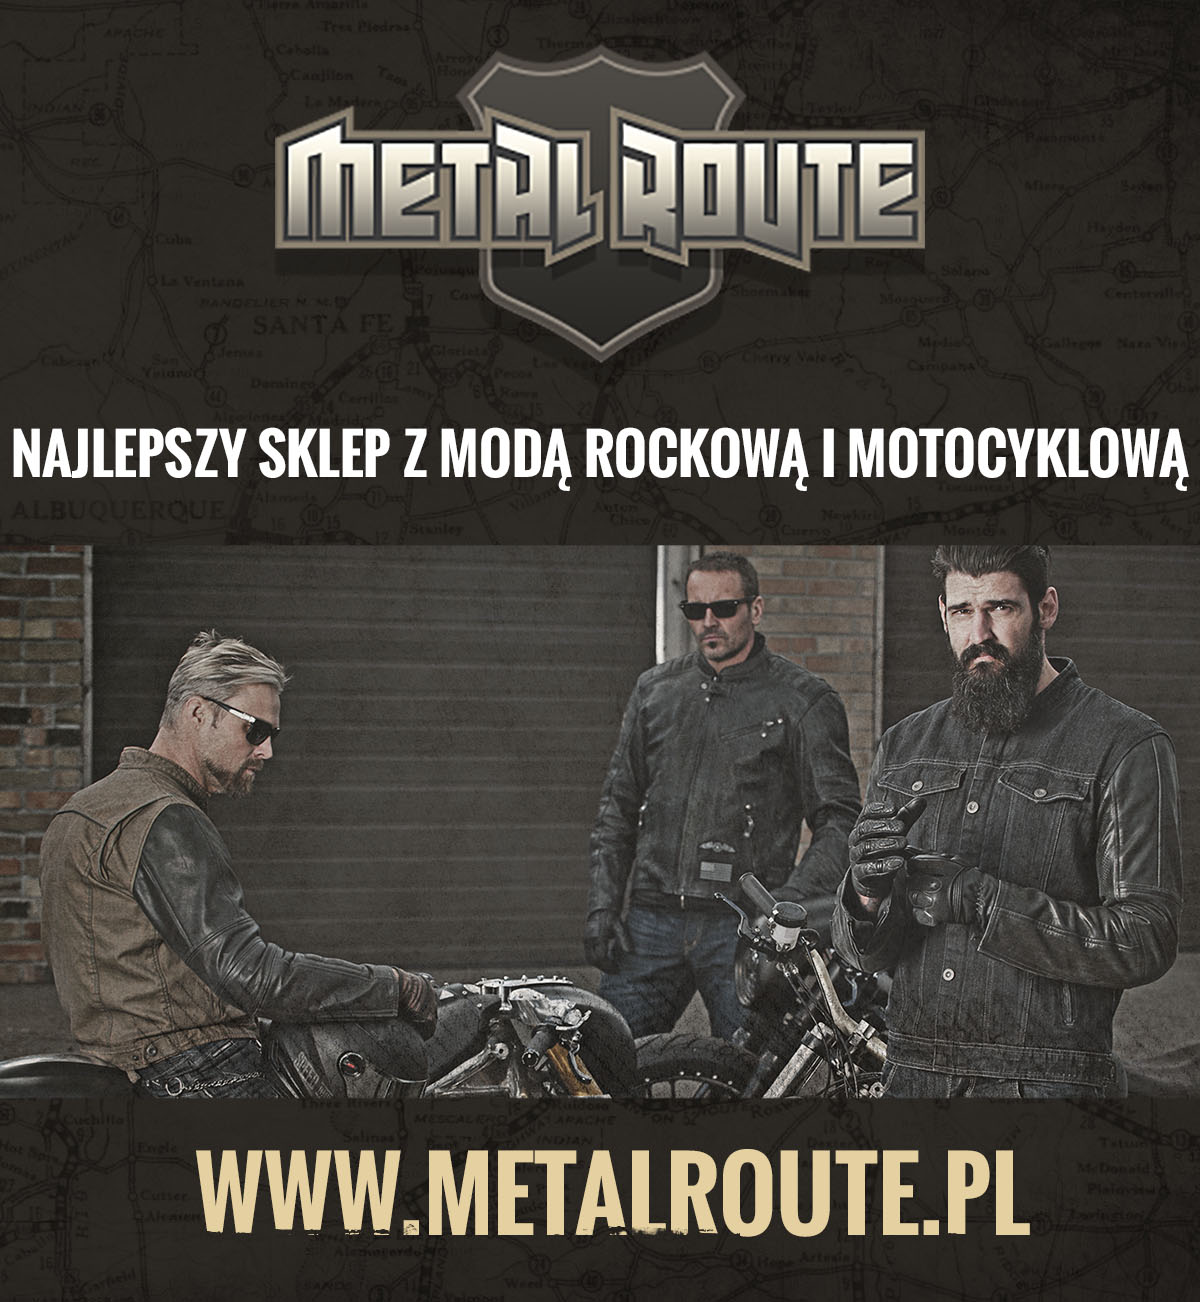 Moda rockowa i motocyklowa